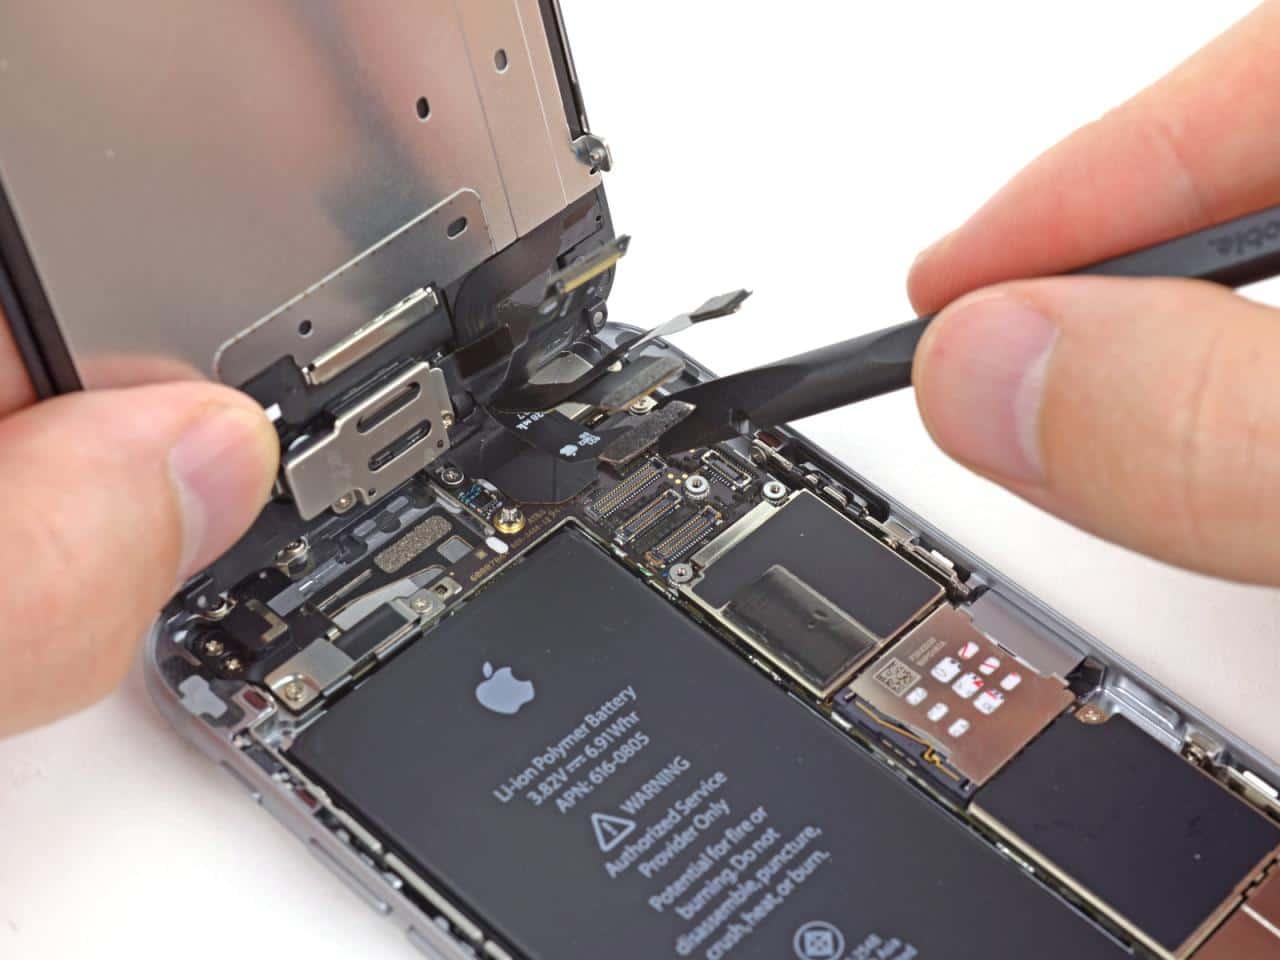 sua iphone 6s bi do 3 Làm cách nào để sửa iPhone 6 plus bị đơ hiệu quả